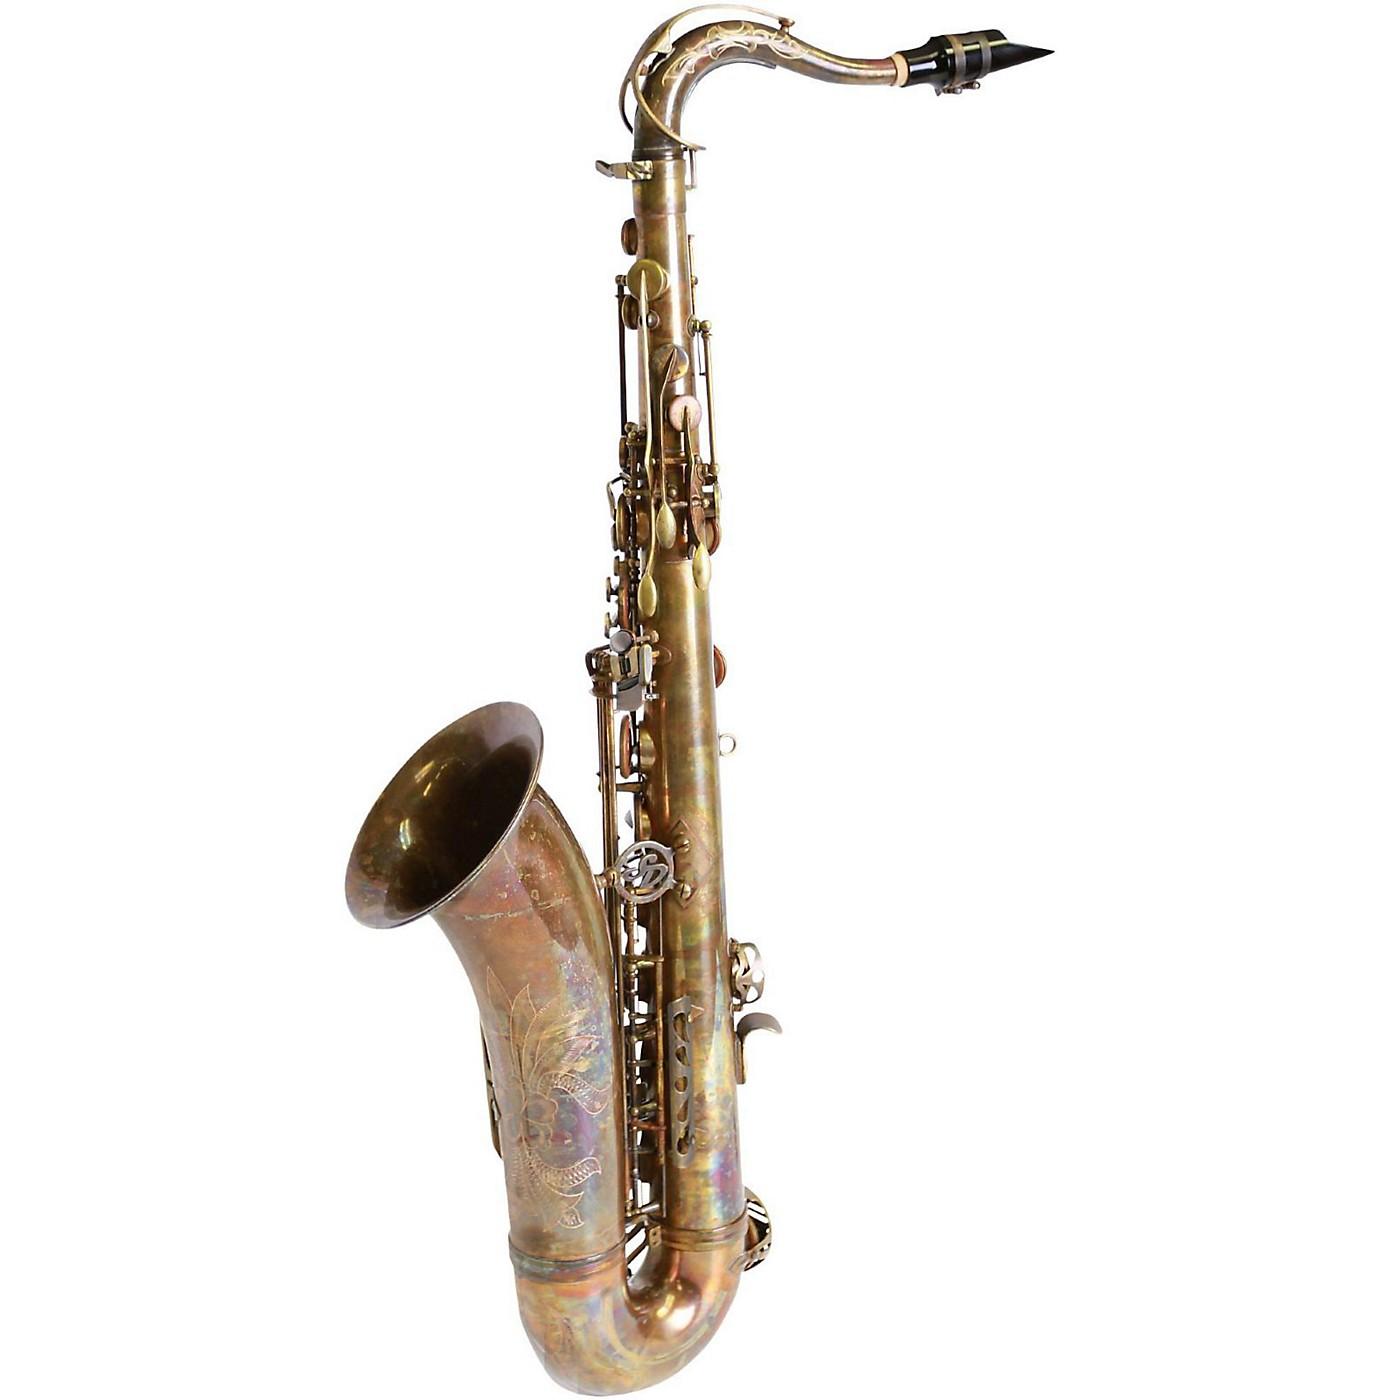 Sax Dakota SDT-XR 92 Professional Tenor Saxophone thumbnail